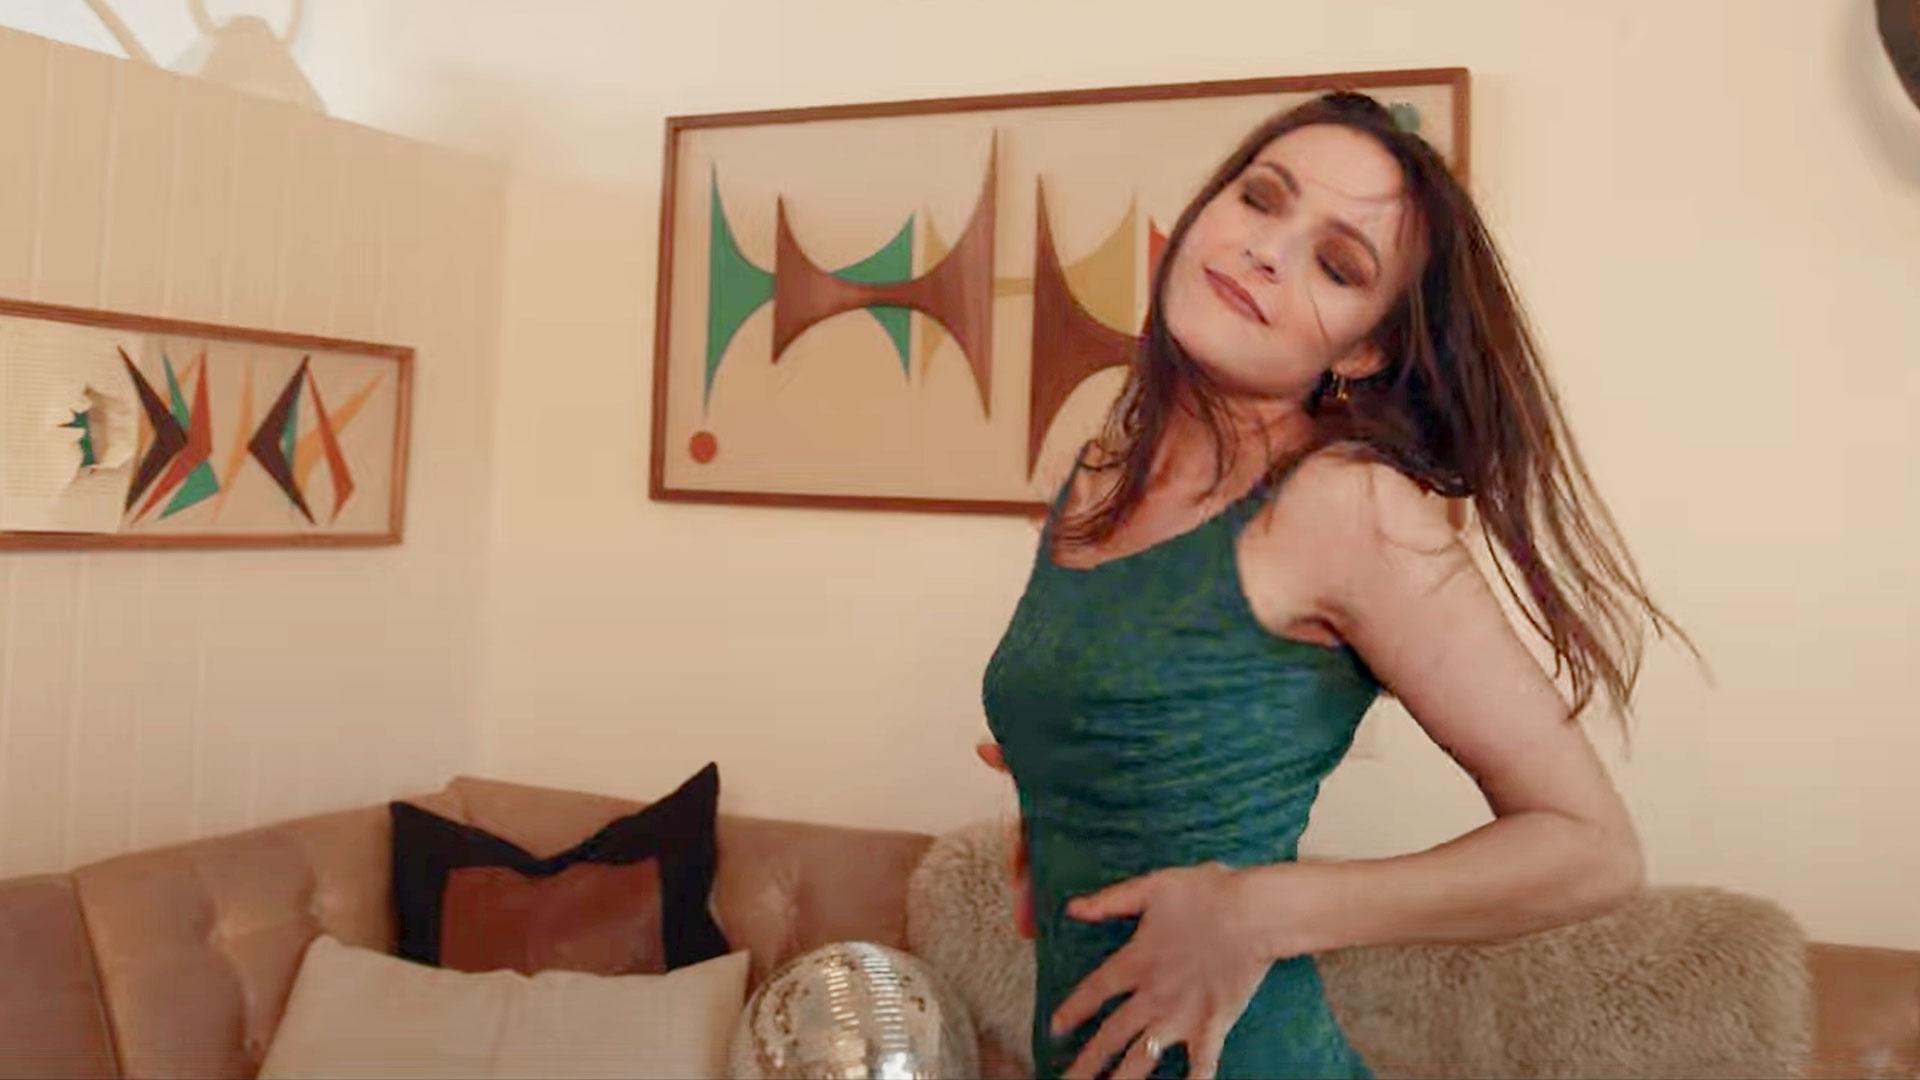 Monica Aben / Reasons to Reminisce - video still 1